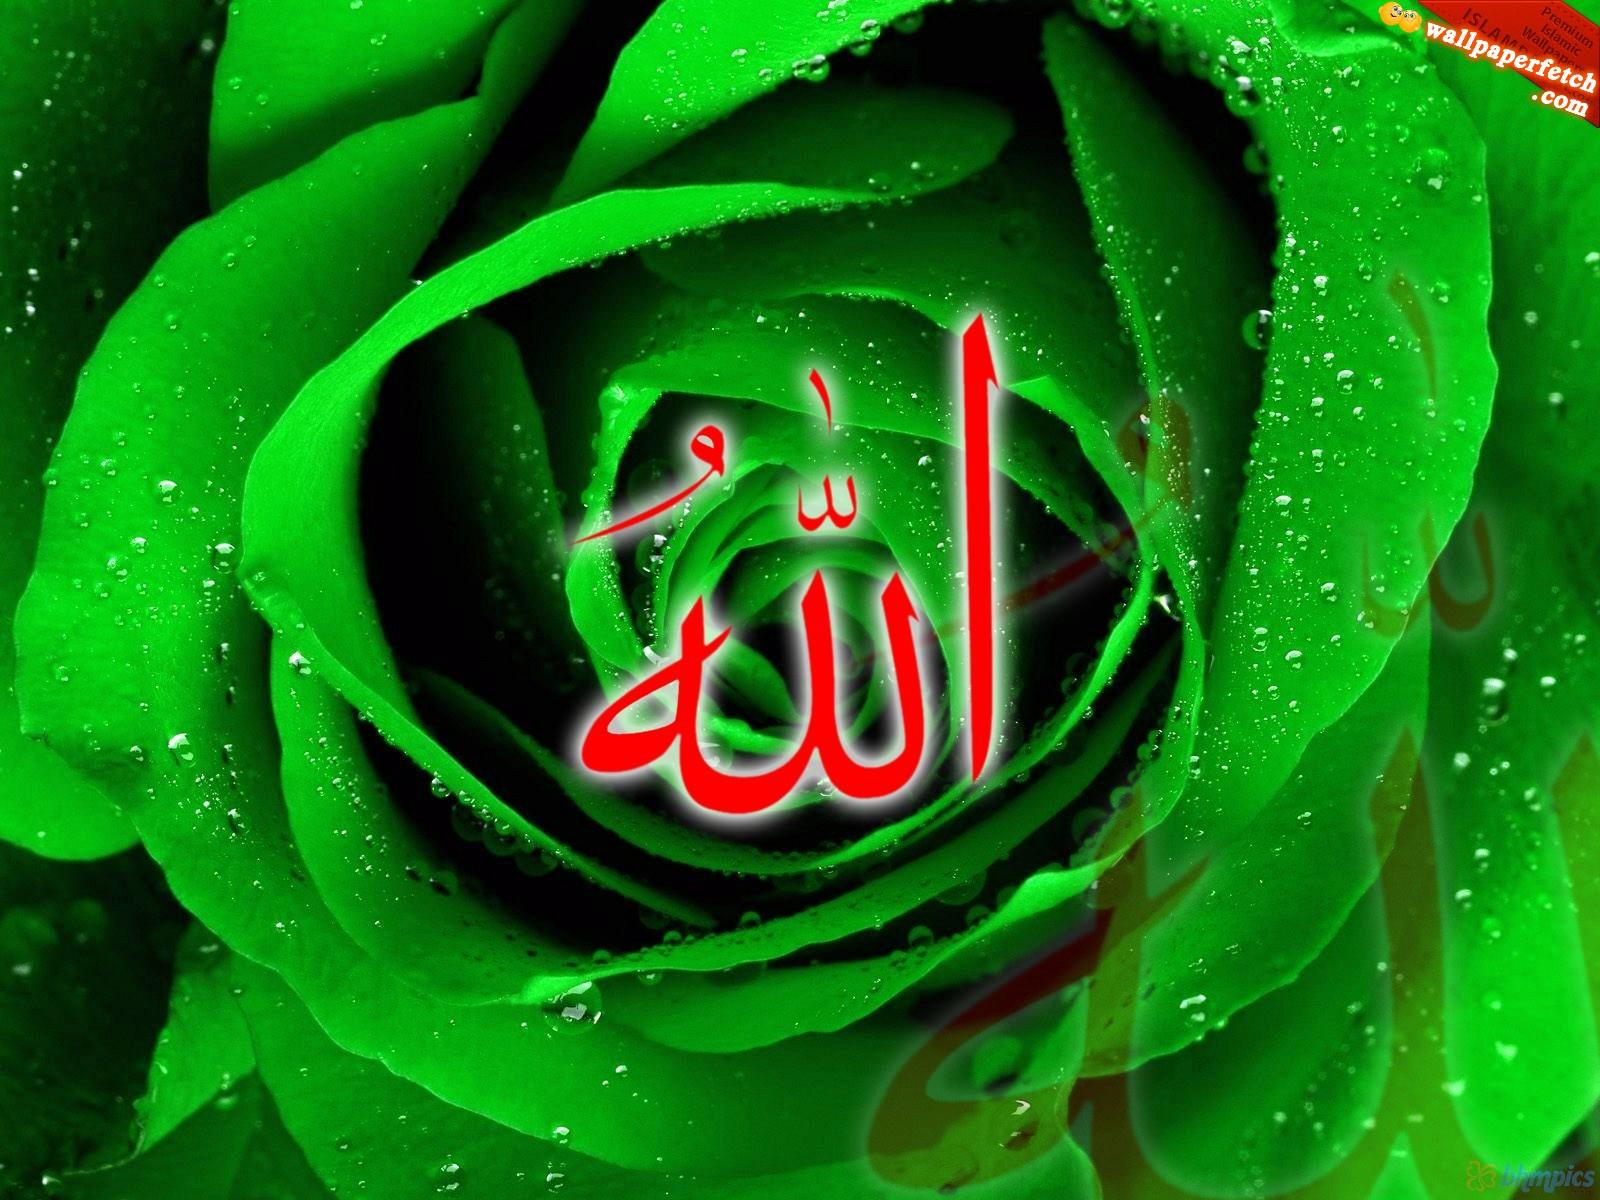 http://2.bp.blogspot.com/-VKIsRcoaGGs/T8pn3tGMh2I/AAAAAAAAPTw/4WZgoFg0Pb0/s1600/red-allah-wallpaper-amazing-green-rose.JPG